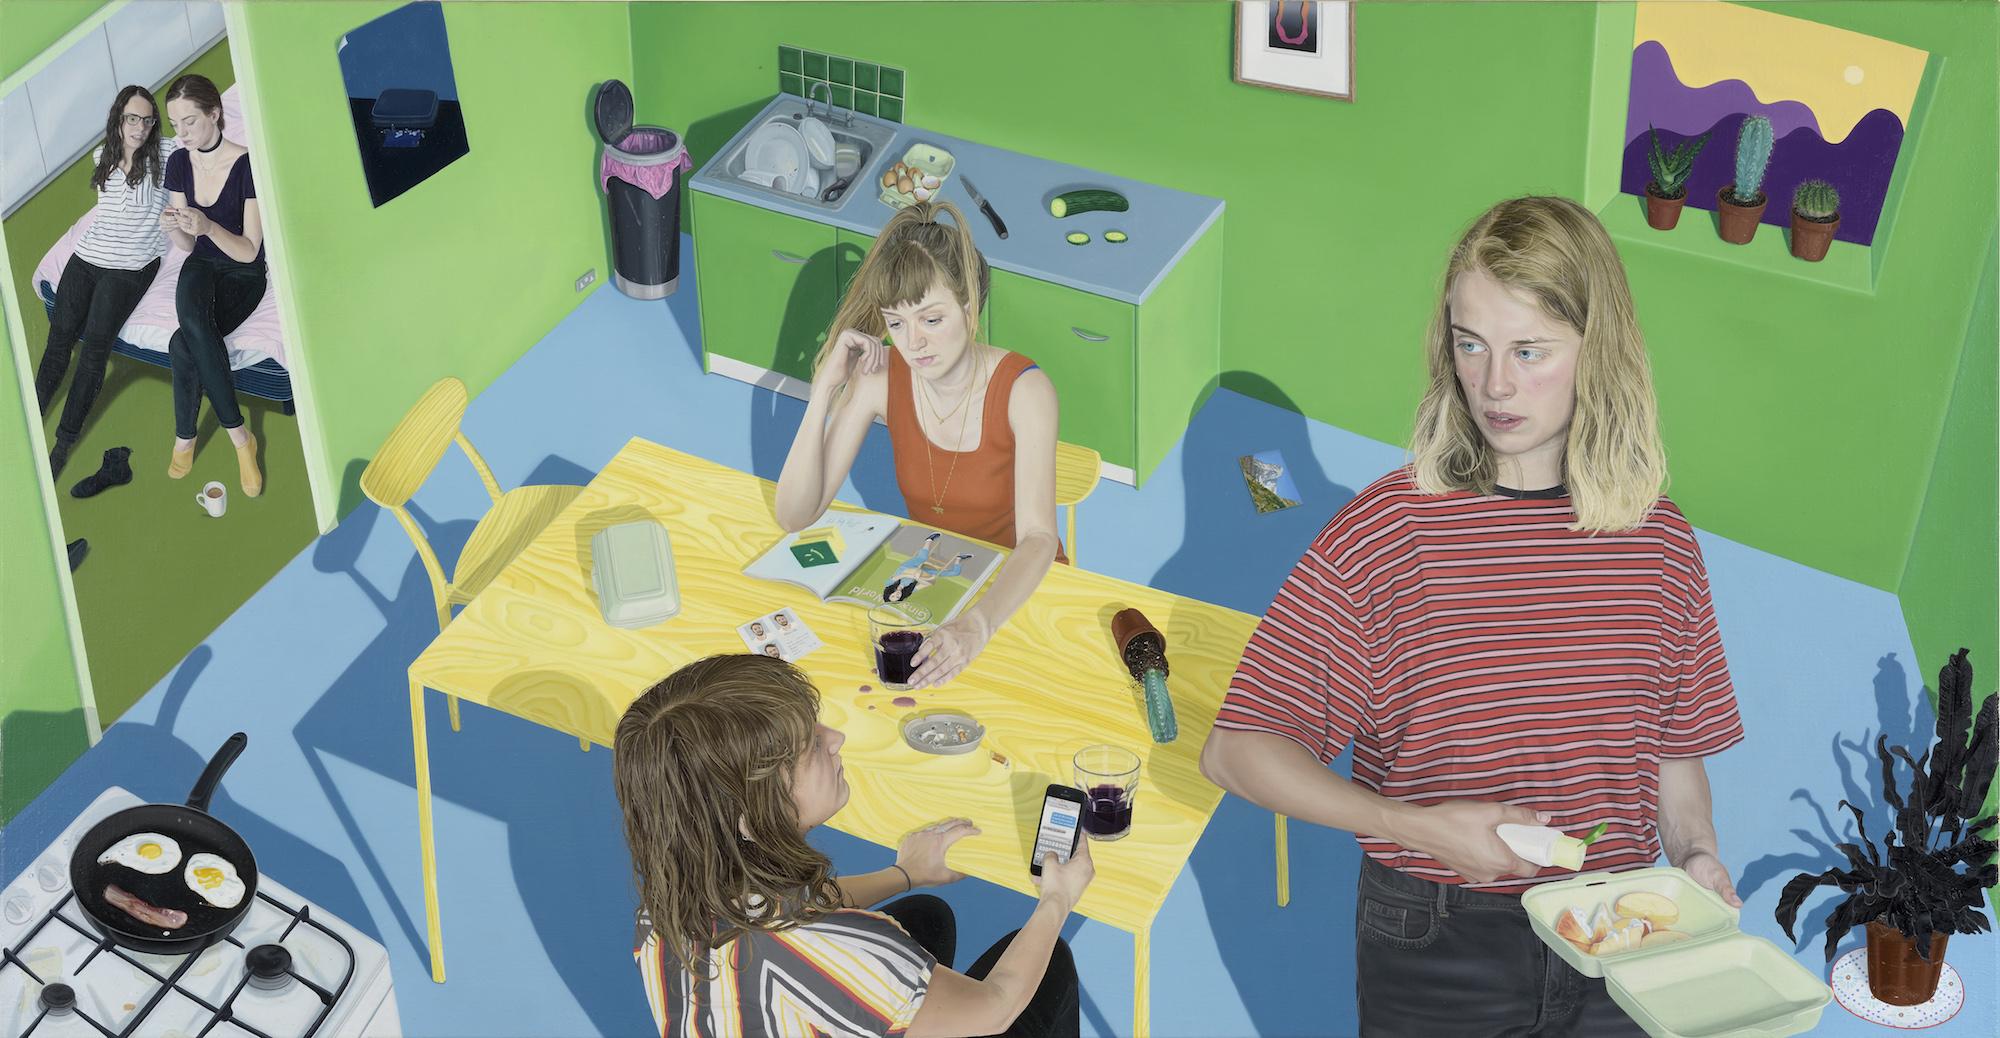 Tristan Pigott's oil painting for Marika Hackman's album, I'm Not Your Man